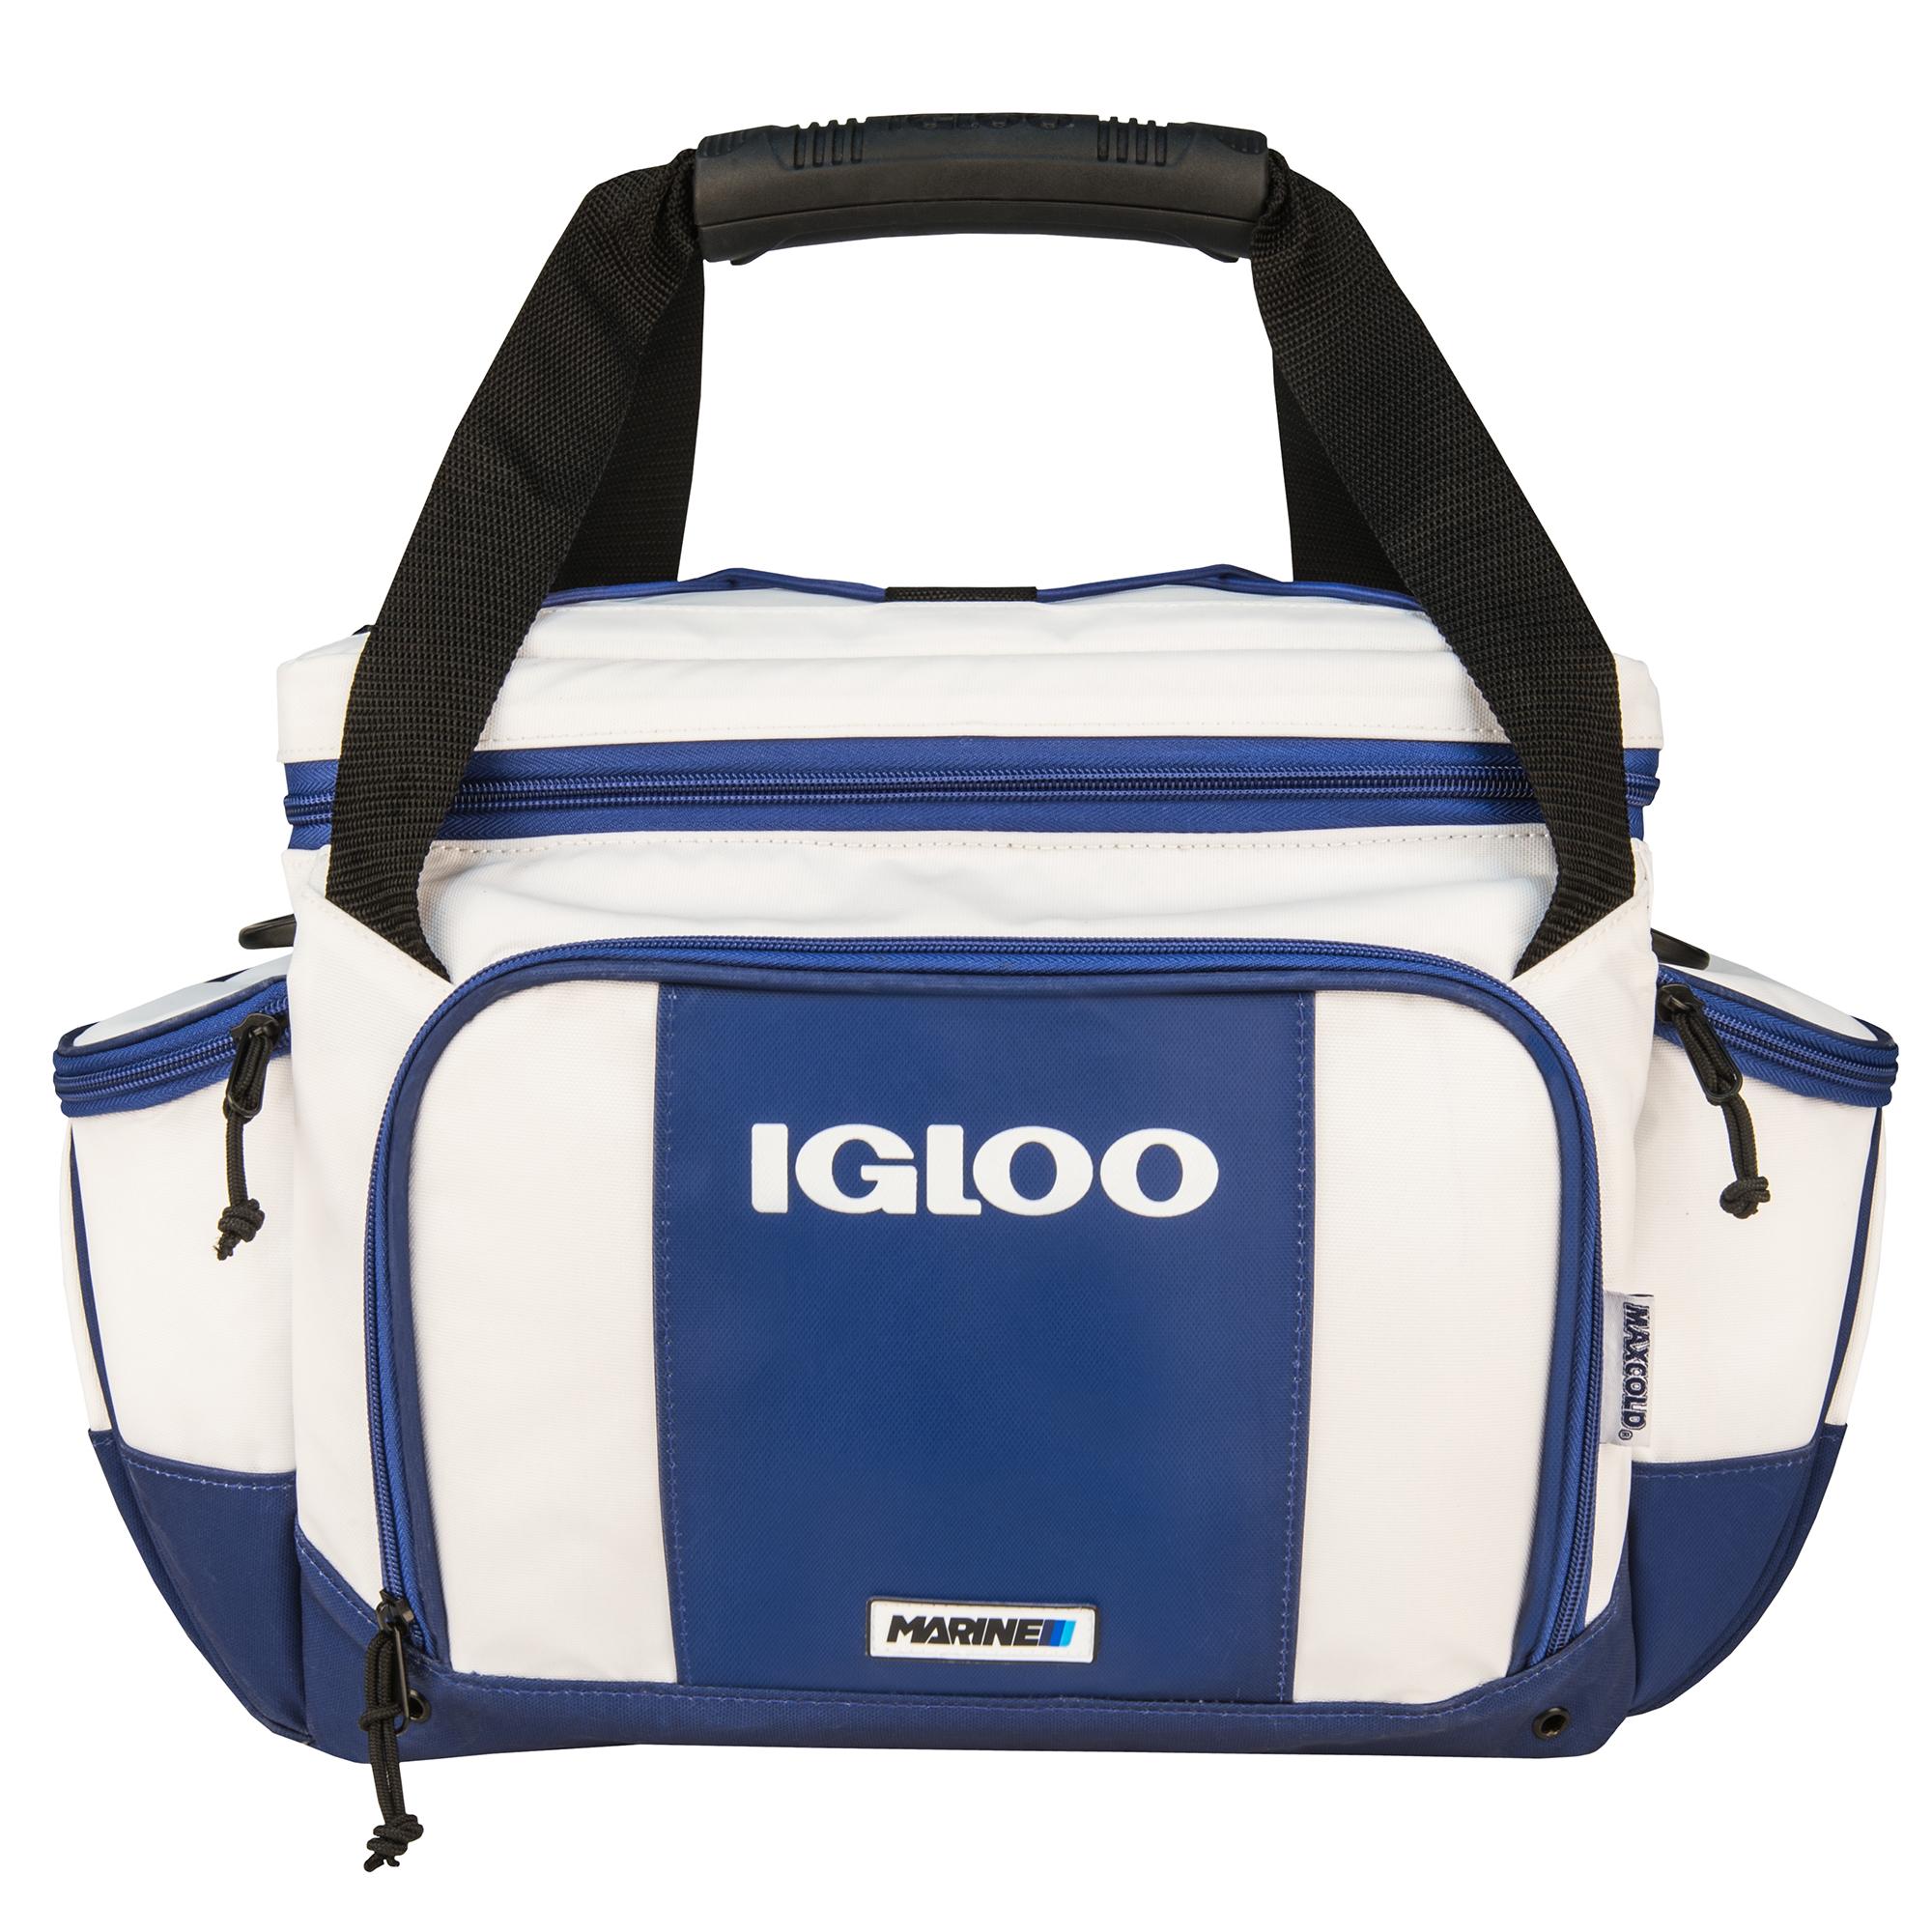 Igloo Marine Ultra 40-Can Tackle Box Cooler